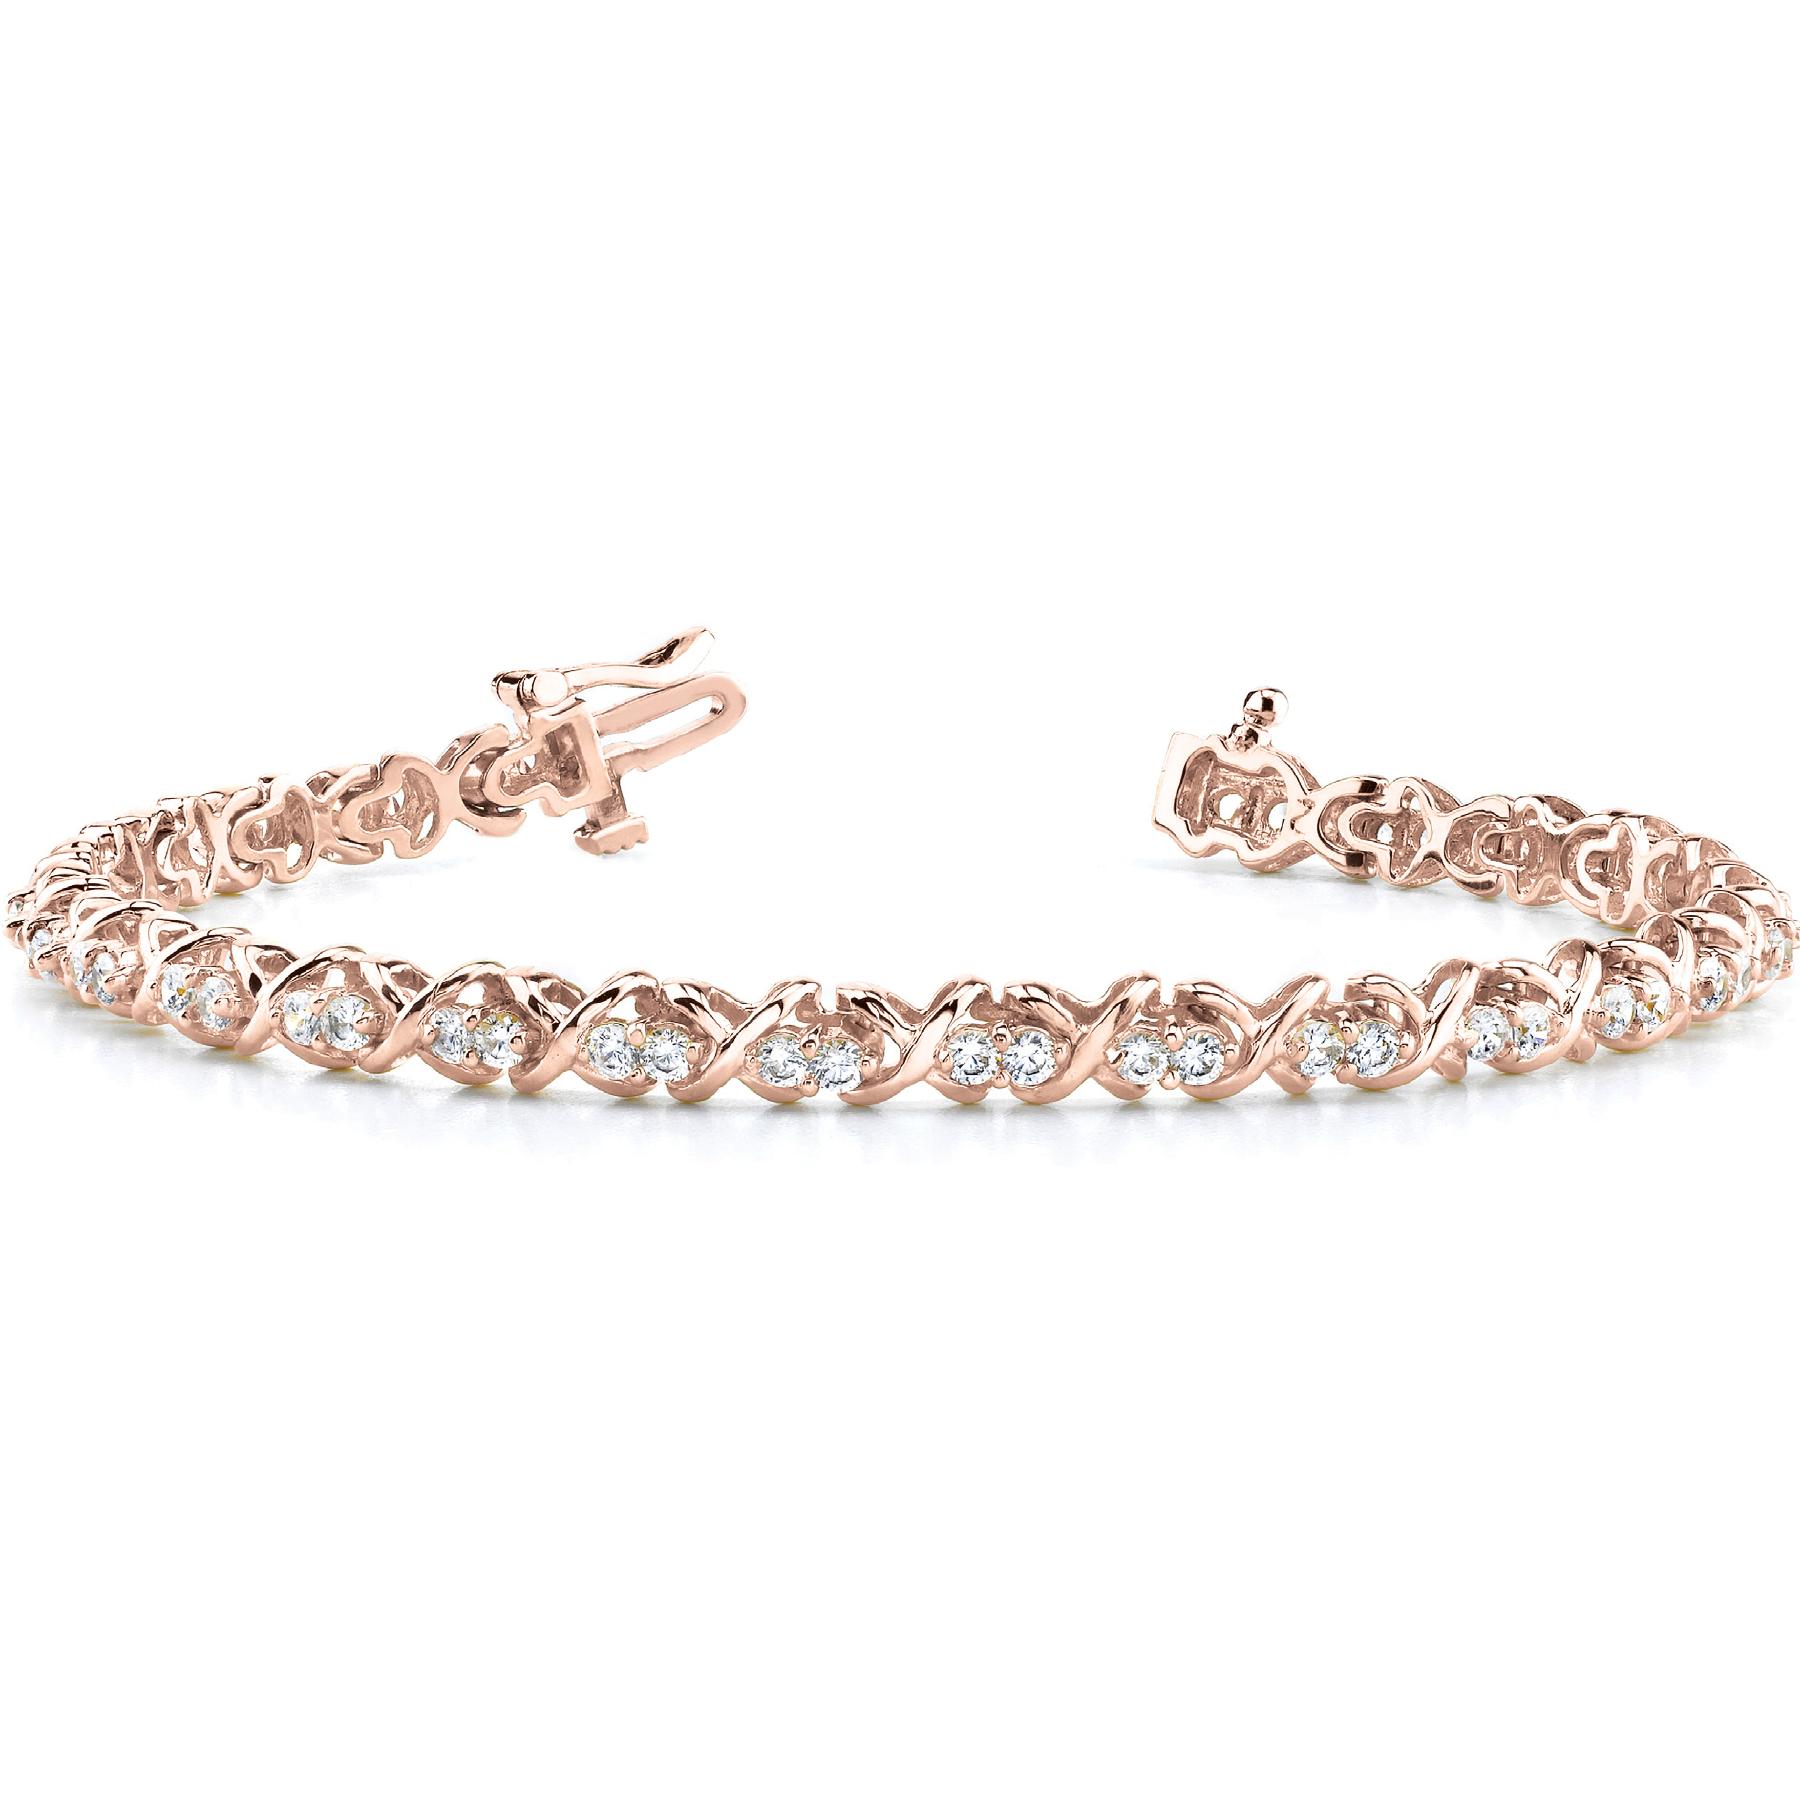 14k-rose-gold-xo-tennis-diamond-bracelet-4485-01-25